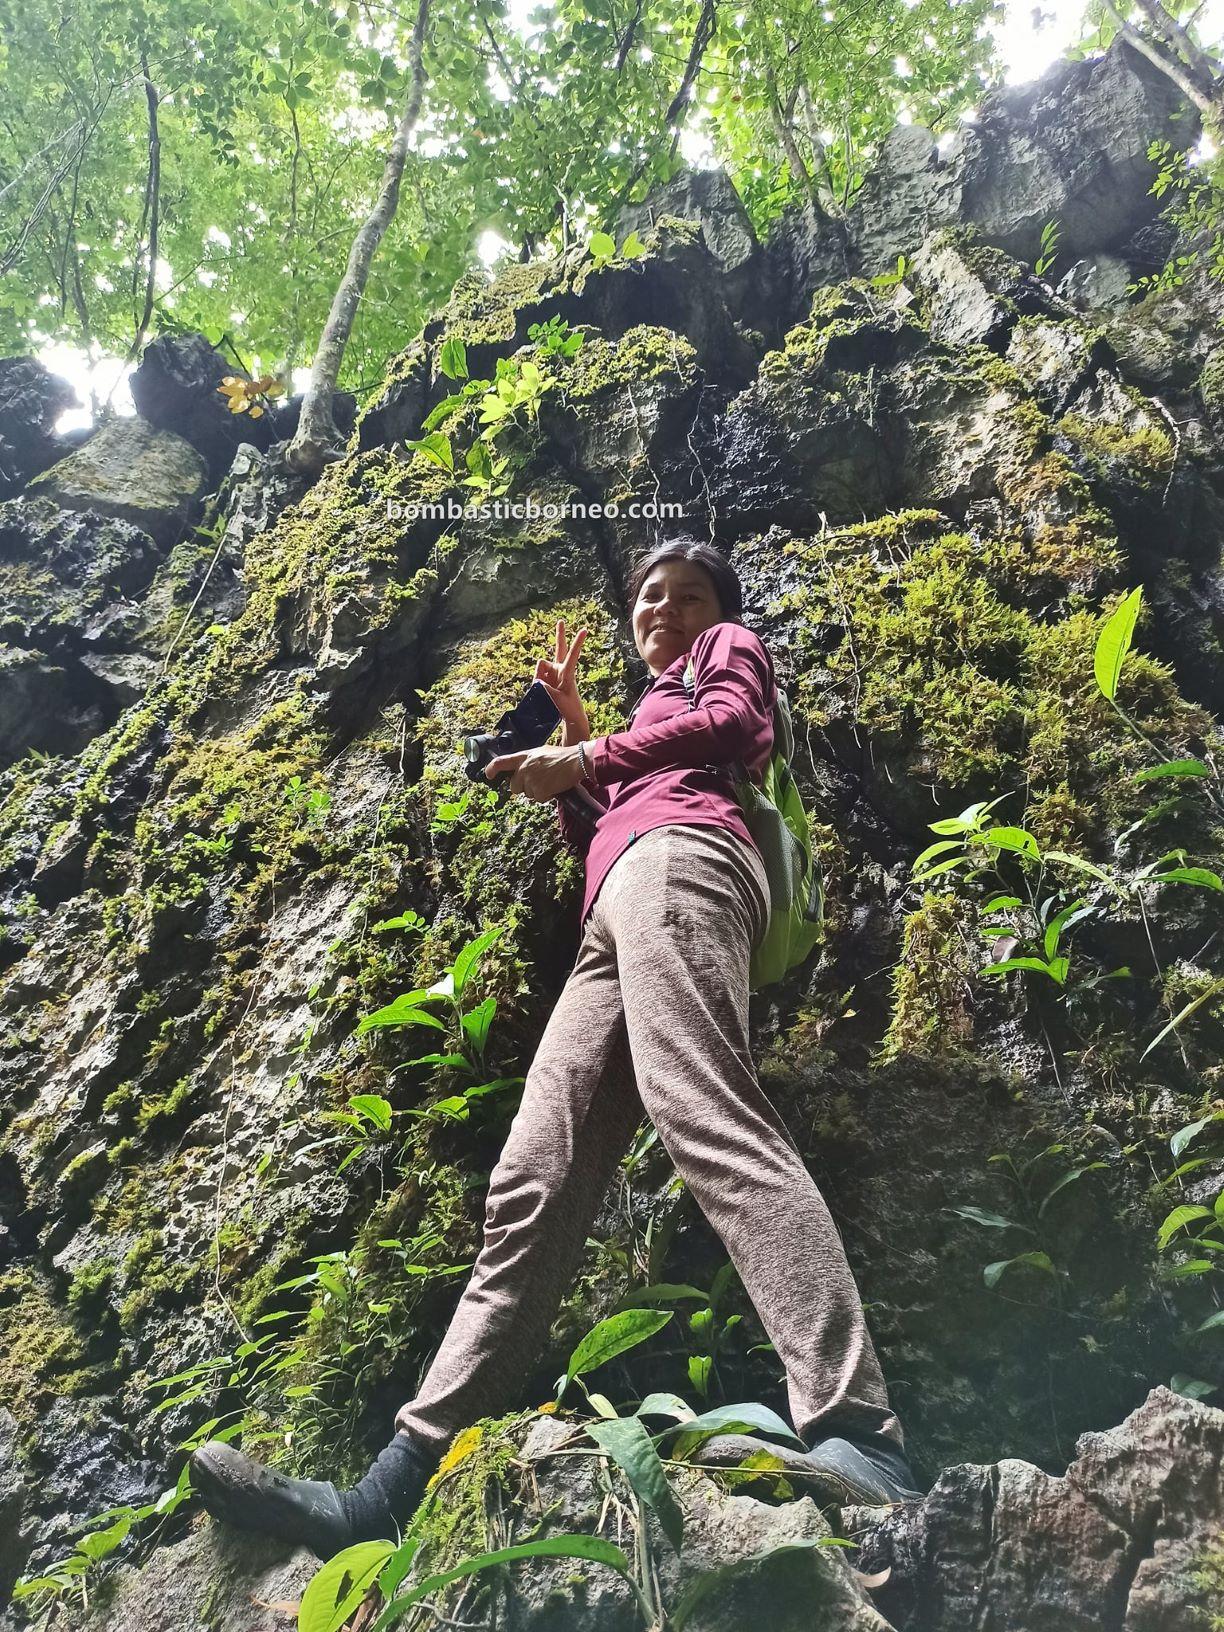 Bung Mawang, Kampung Serumah, Gayu village, jungle trekking, hiking, Kuching, Tourism, tourist attraction, travel local, limestone ravine, Tiang Badak, Borneo, 探索婆罗洲游踪, 砂拉越古晋, 马来西亚自然生态